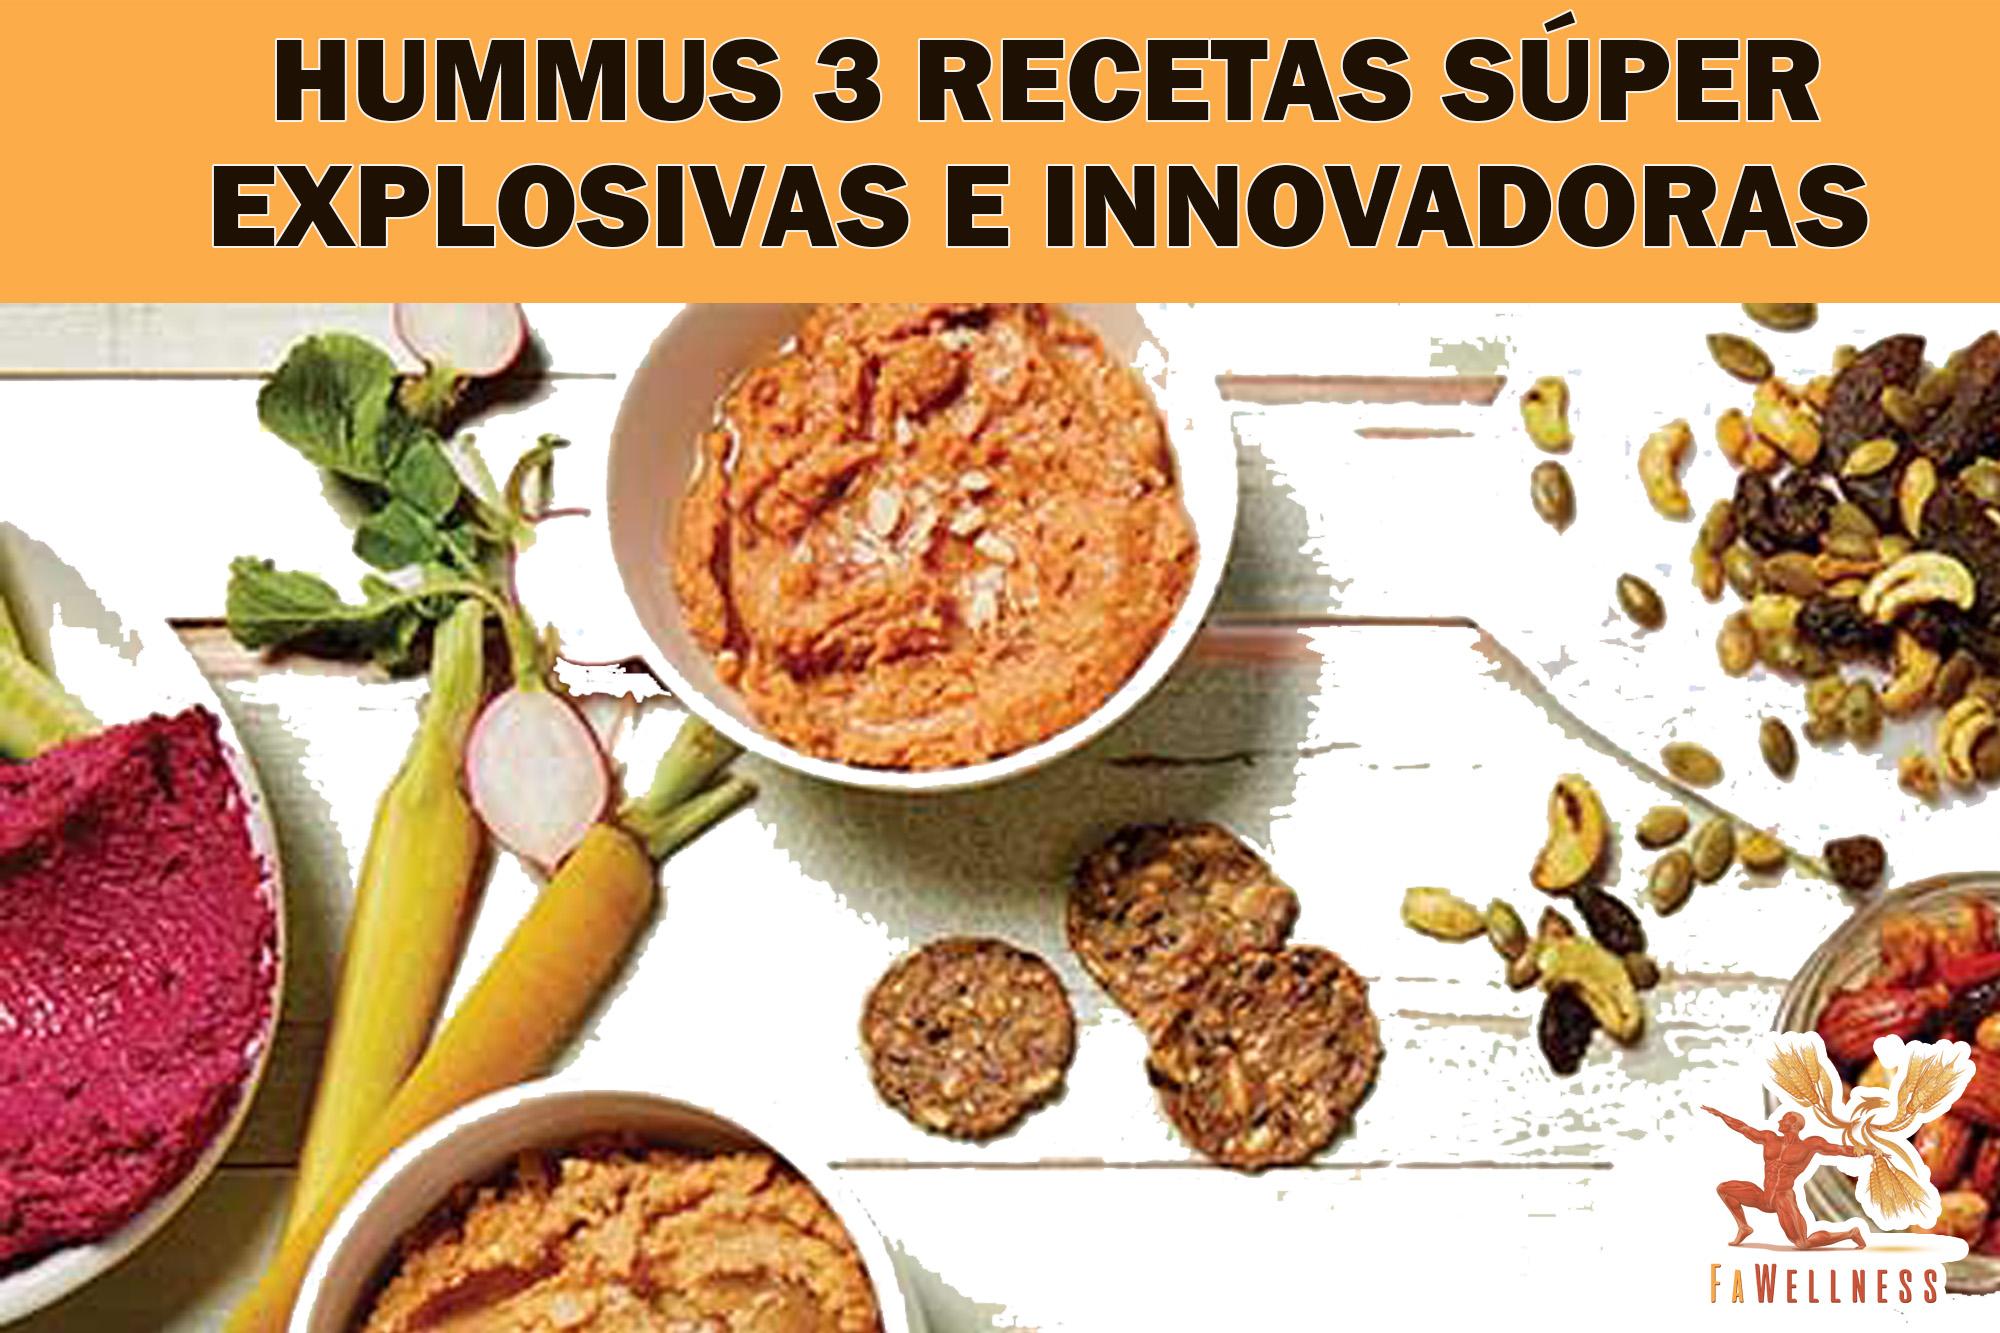 imagen blog FaWellness | HUMMUS  3 Recetas SÚPER EXPLOSIVAS E INNOVADORAS